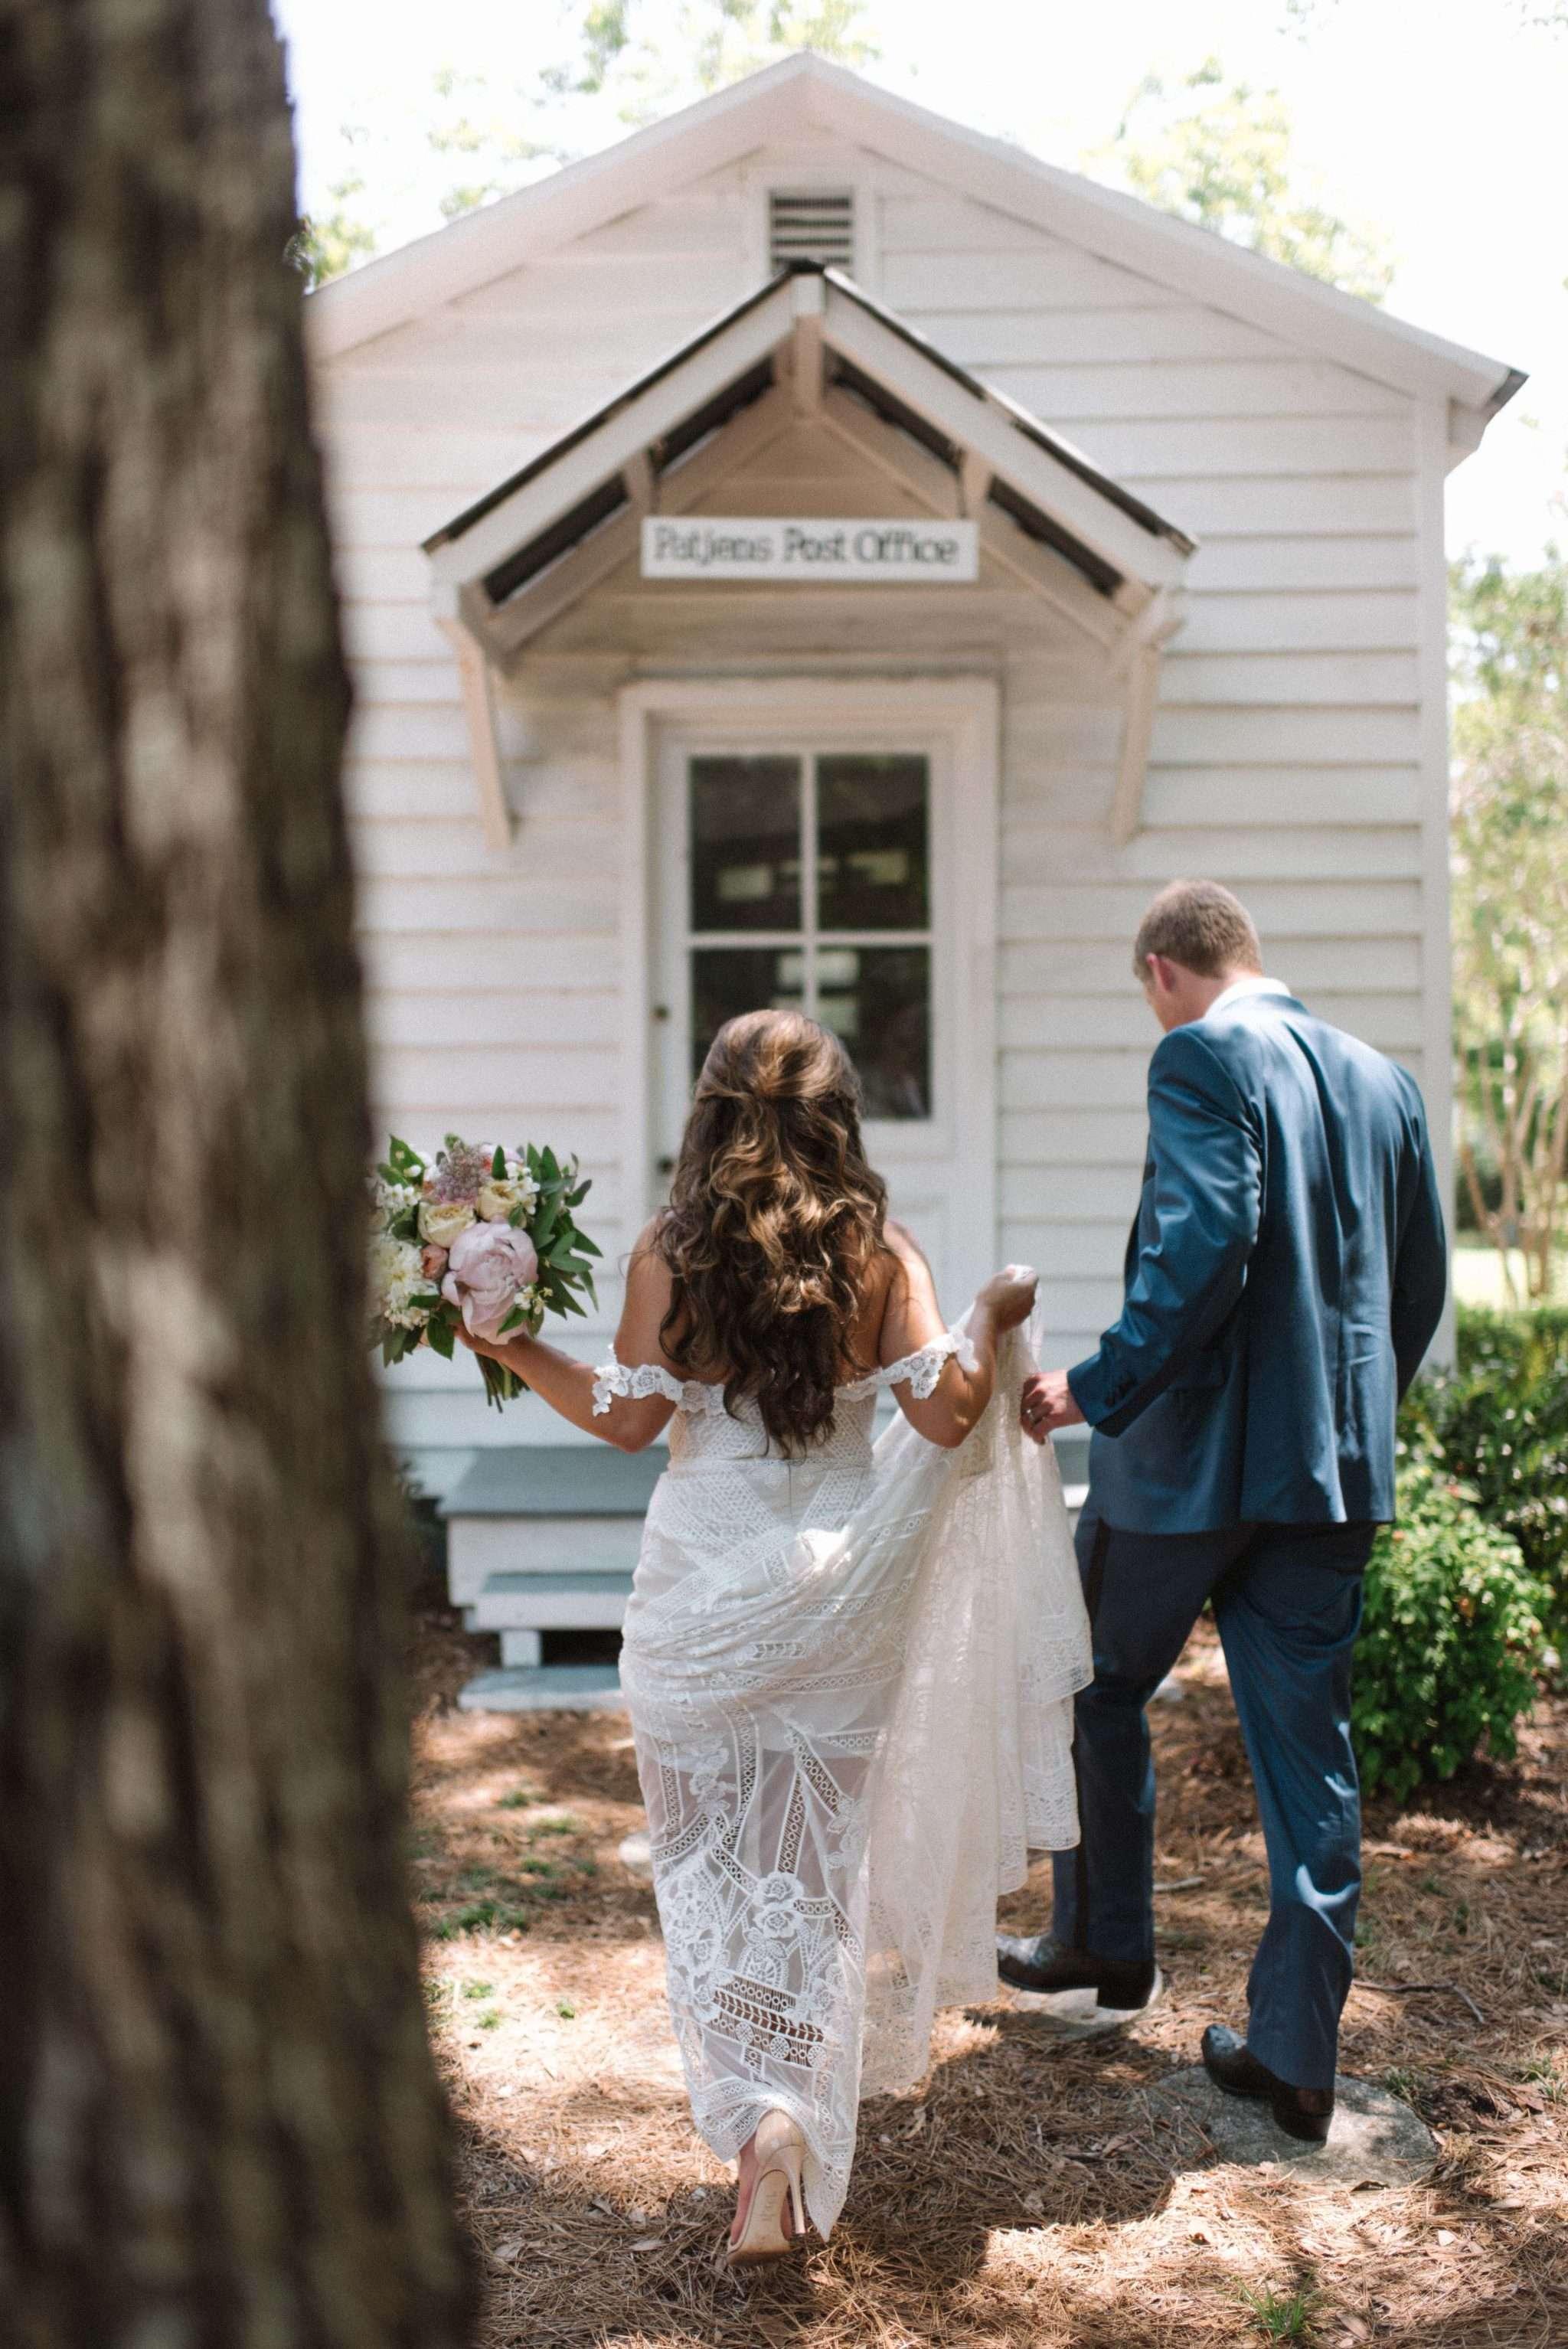 Ultimate Wedding Planning Checklist + Helpful Wedding Planning Tips | Rhyme & Reason